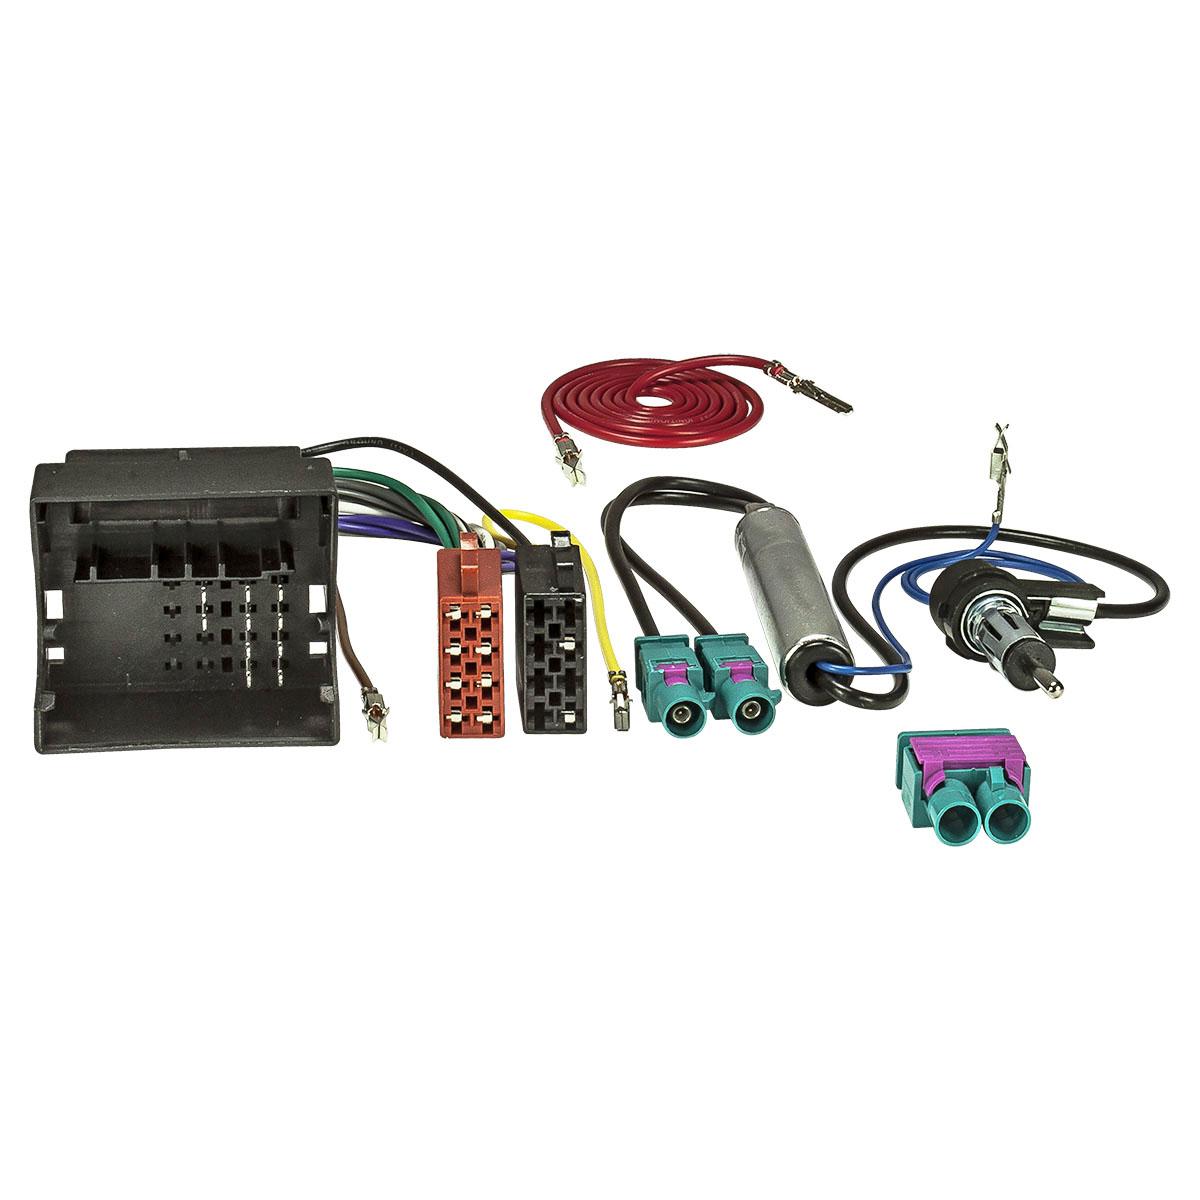 2-DIN Radioblende piano black Quadlock Adapter Antenne VW Touran Sharan Tiguan